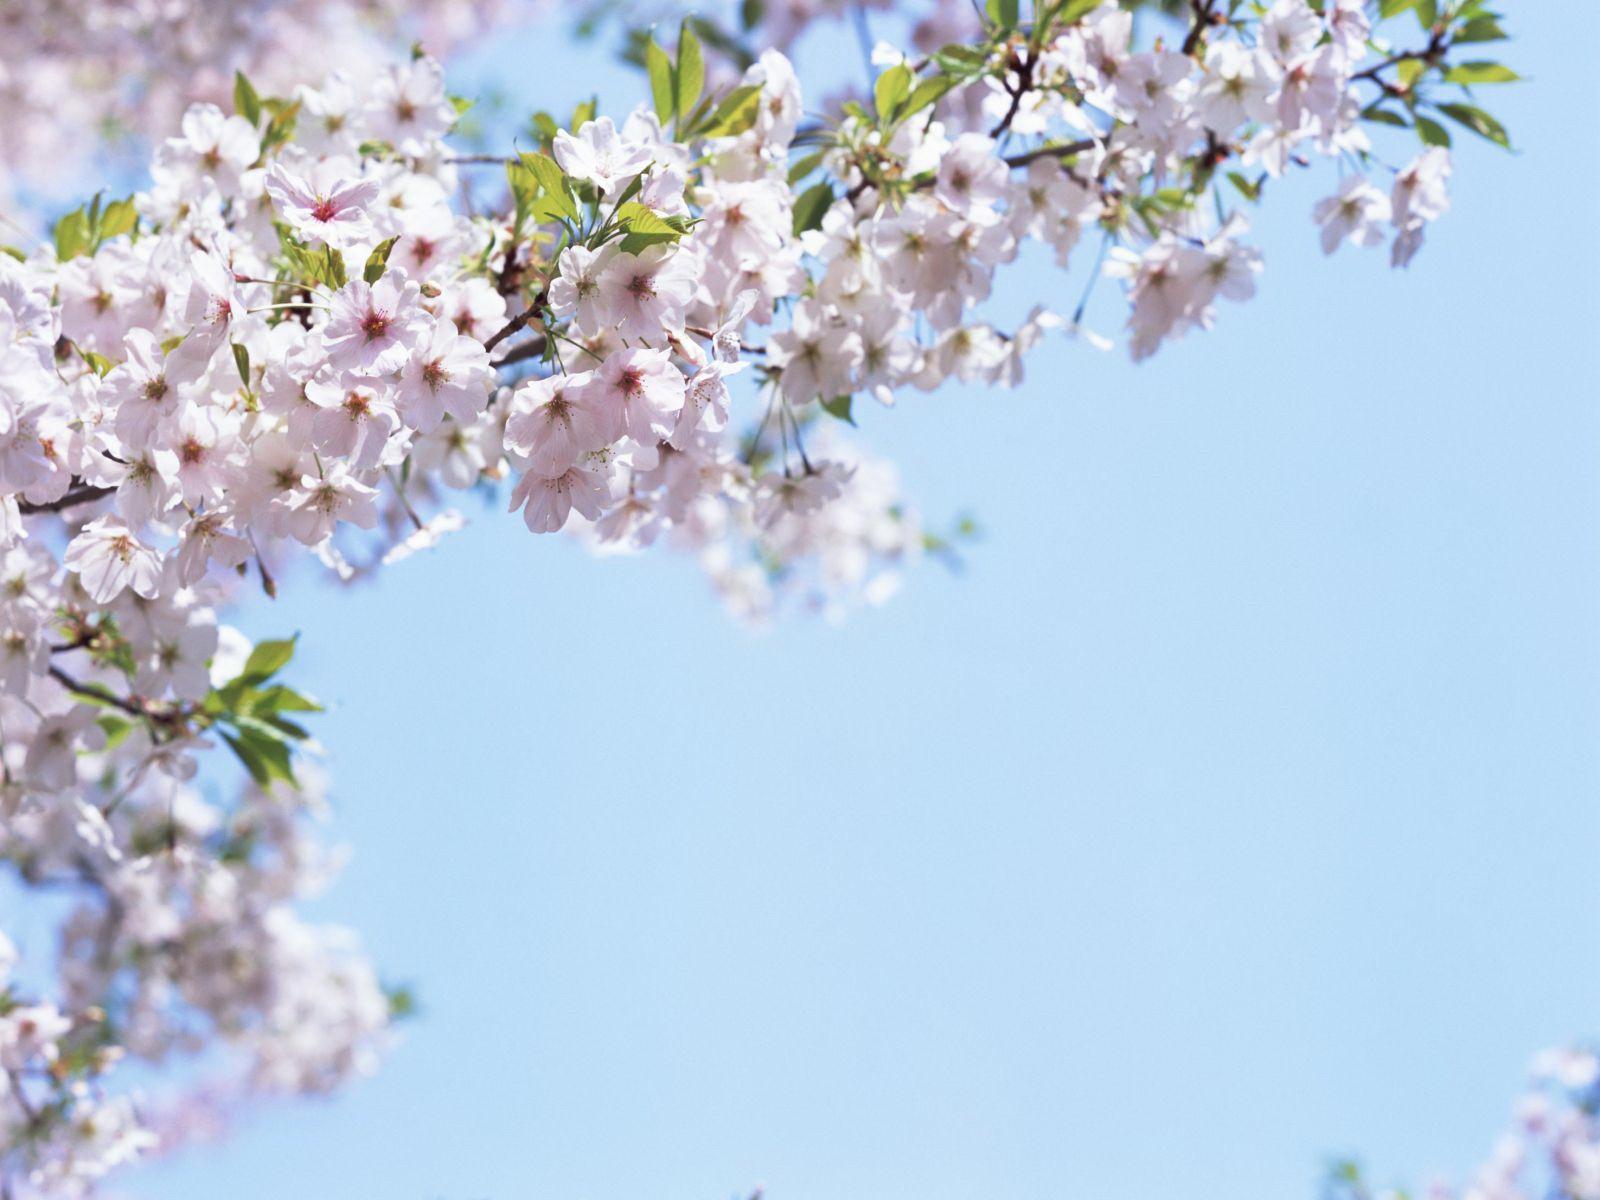 Spring season wallpapers